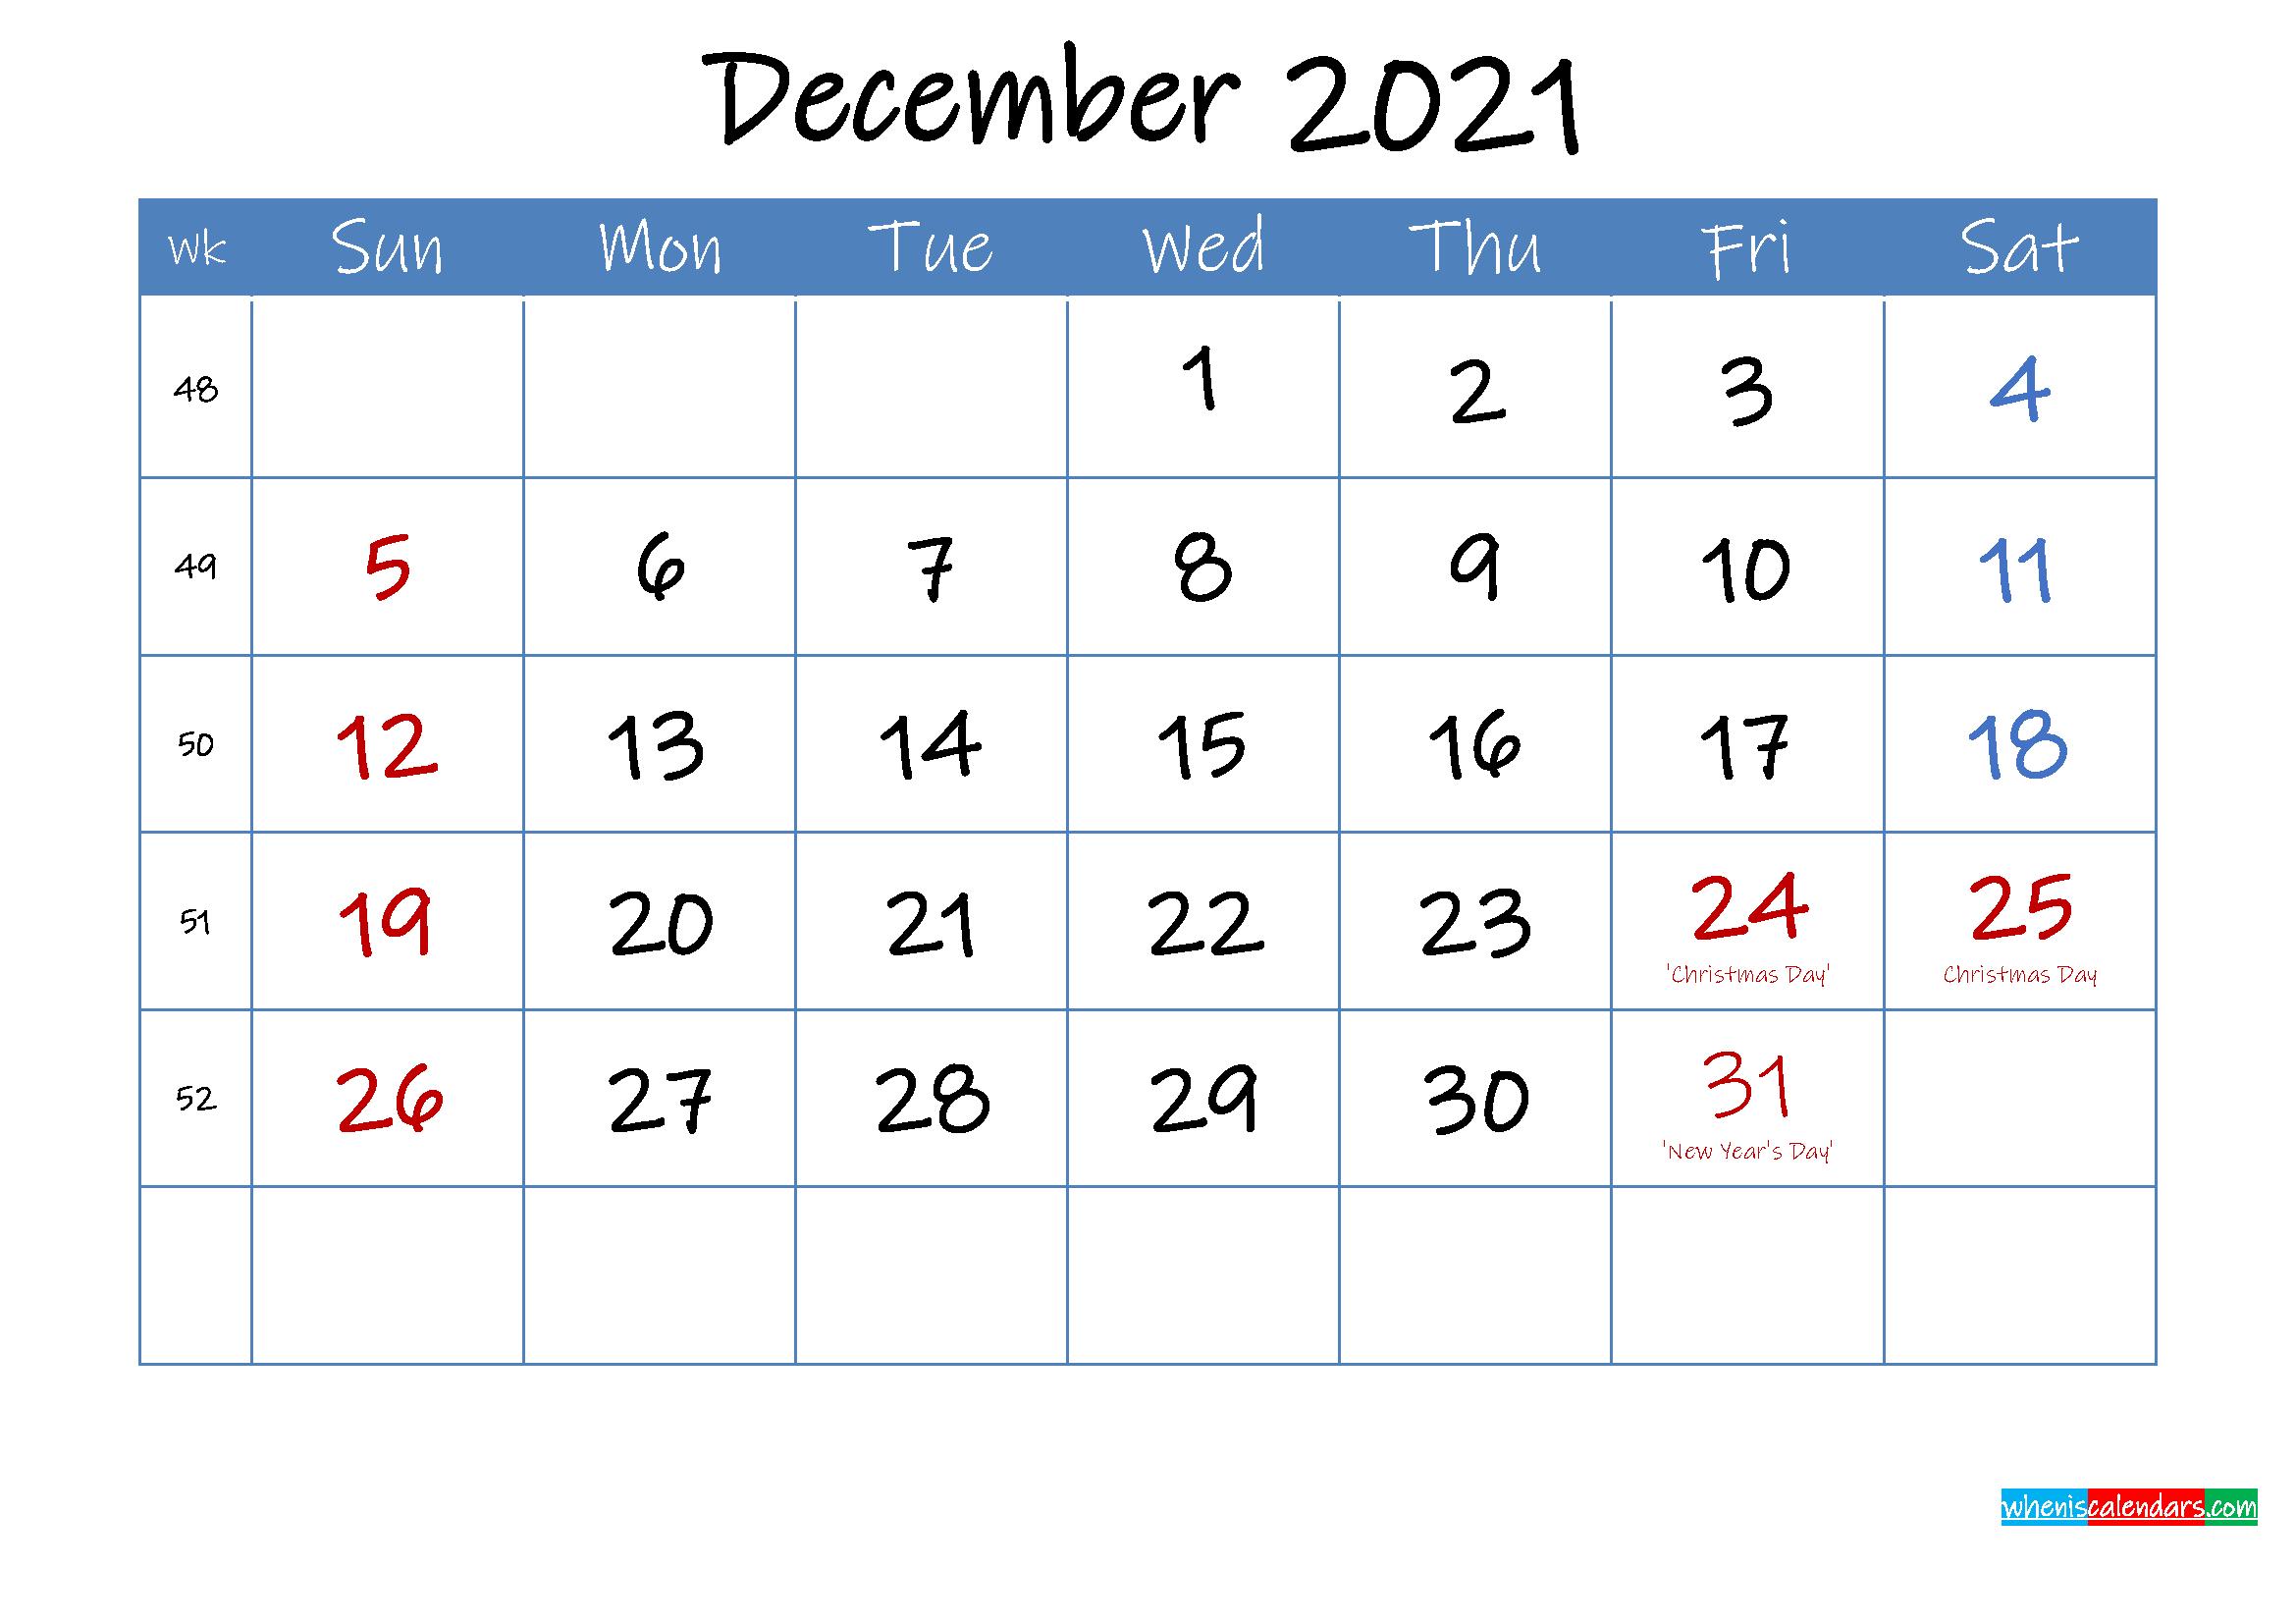 Printable December 2021 Calendar Word - Template Ink21M24